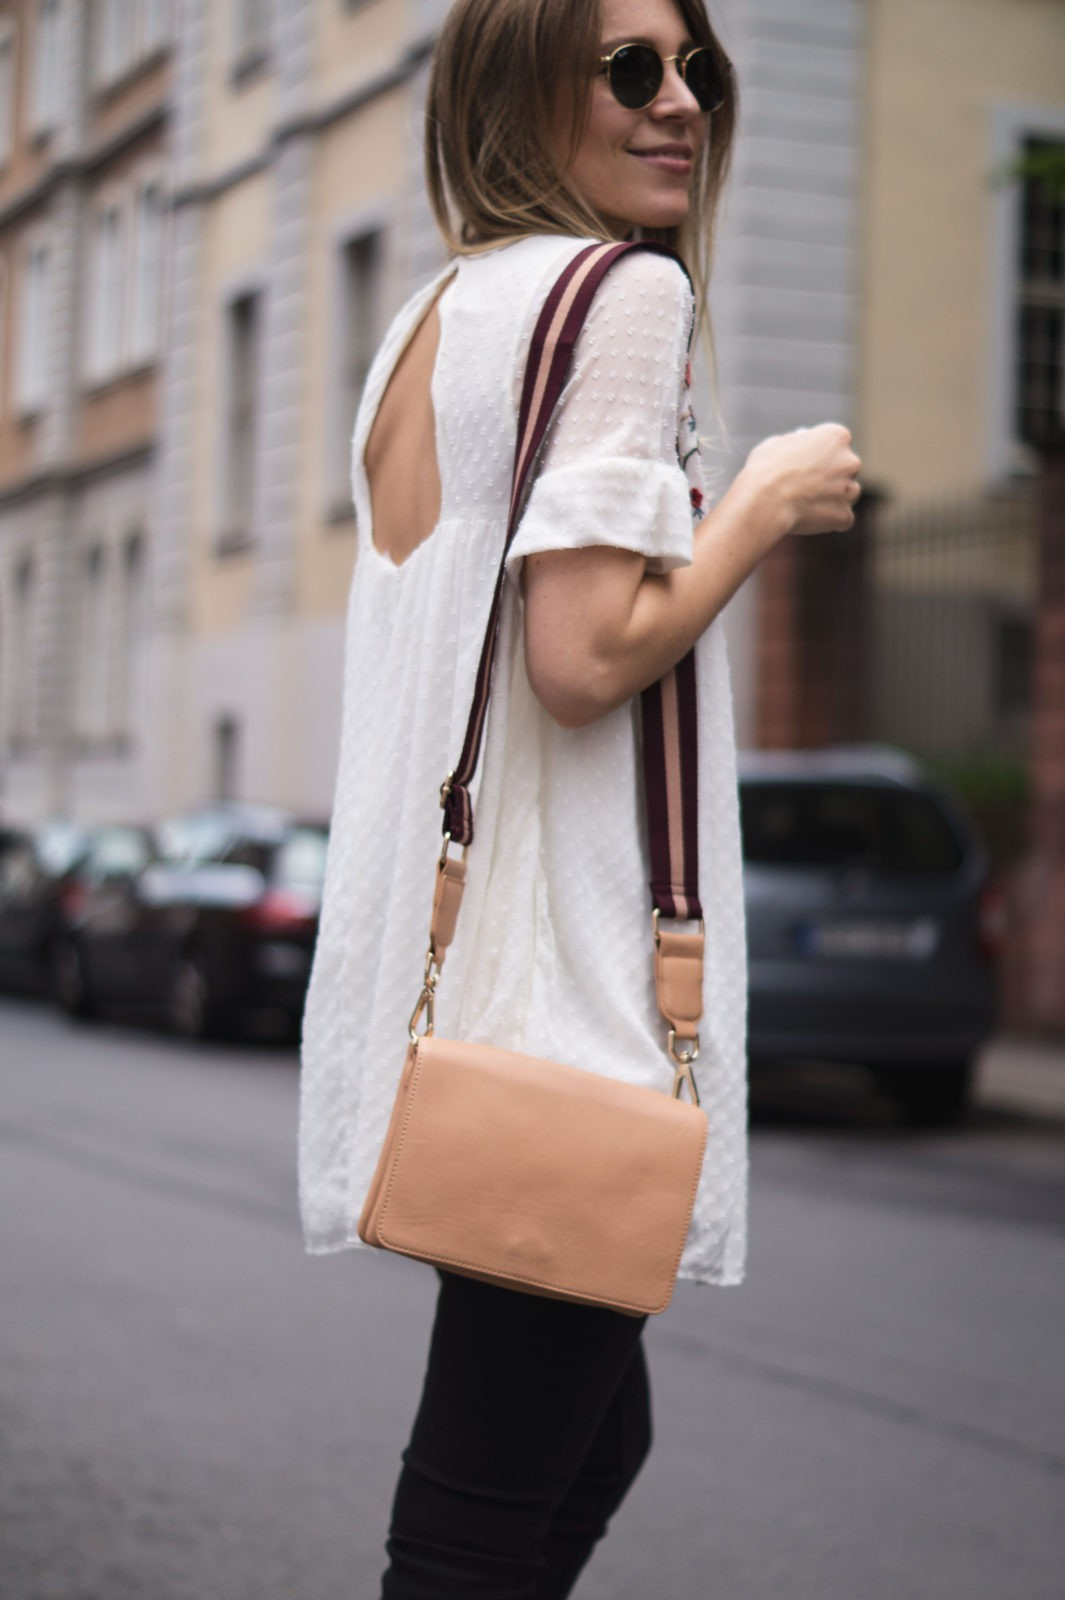 Floral Summer Dress Zara Jumpsuit Black Loafers Pantoletten Sommerkleid Streetstyle Heidelberg Sariety Modeblog Fashionblogger